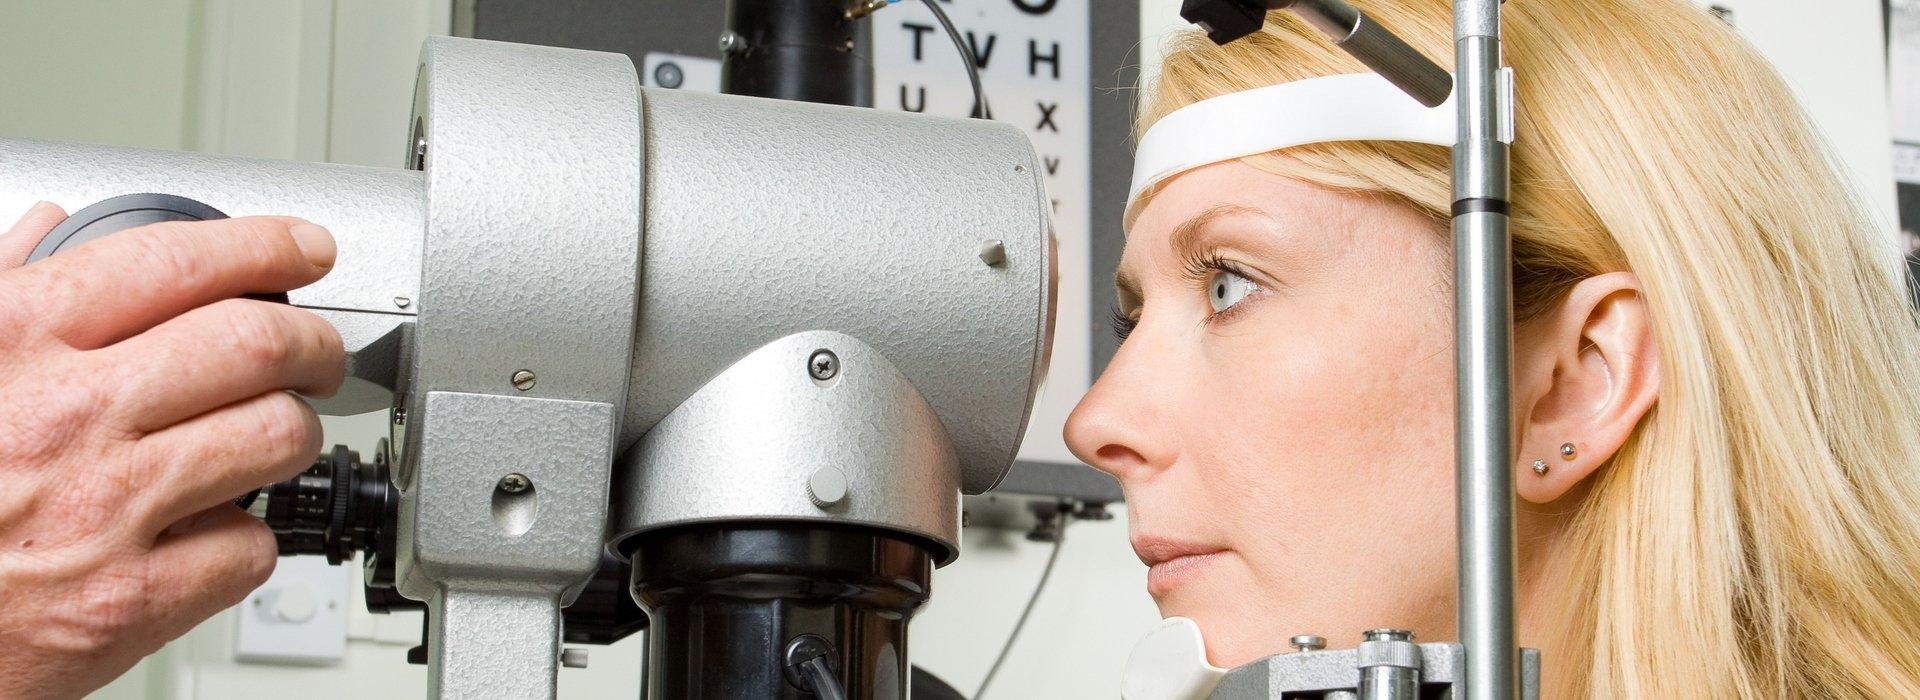 Glaukom Entfernung